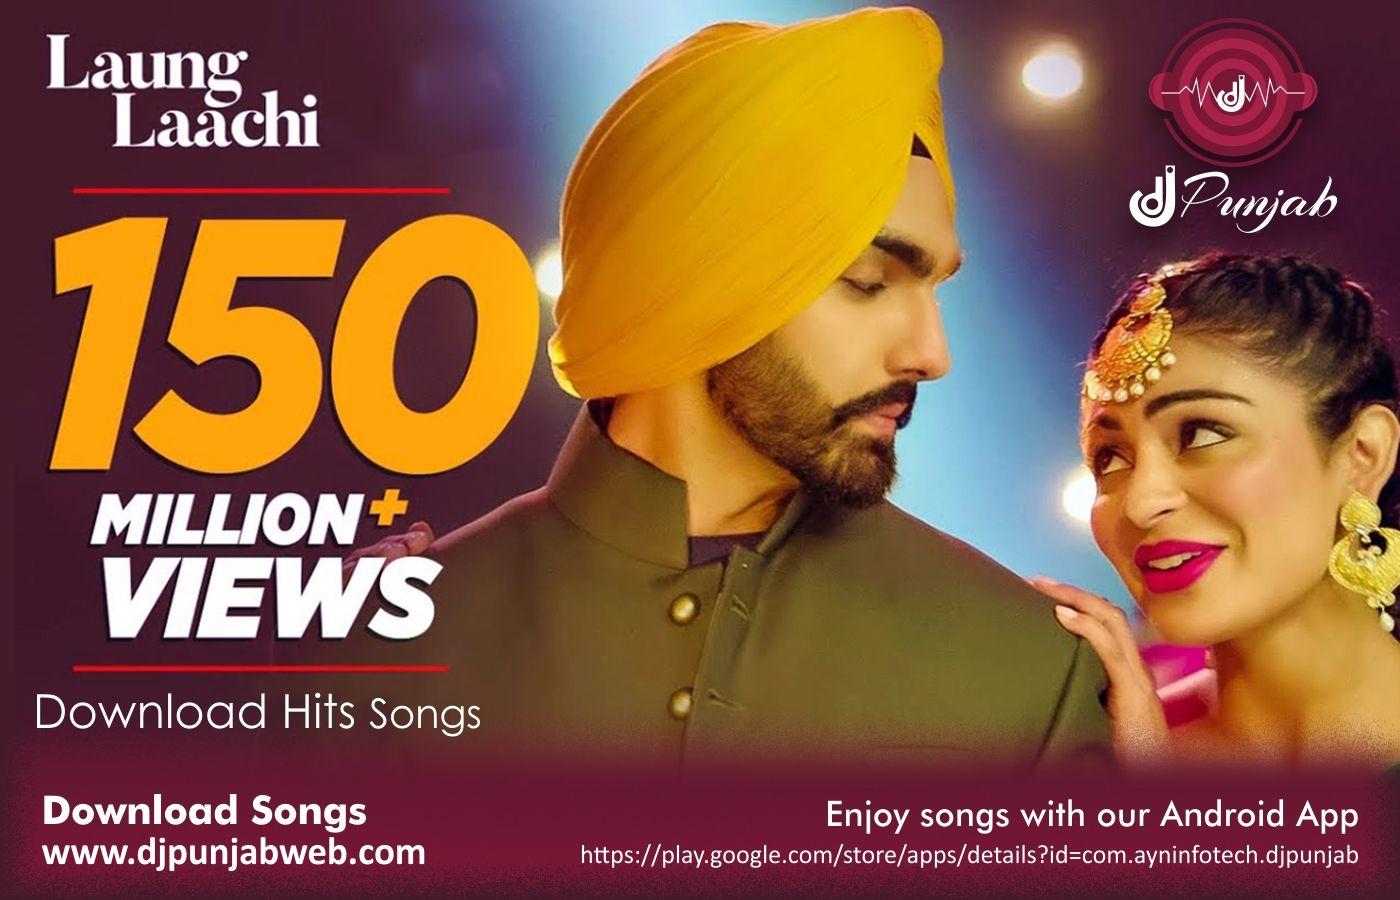 DjPunjab Latest Punjabi MP3 Songs & Movies Download Best Quality